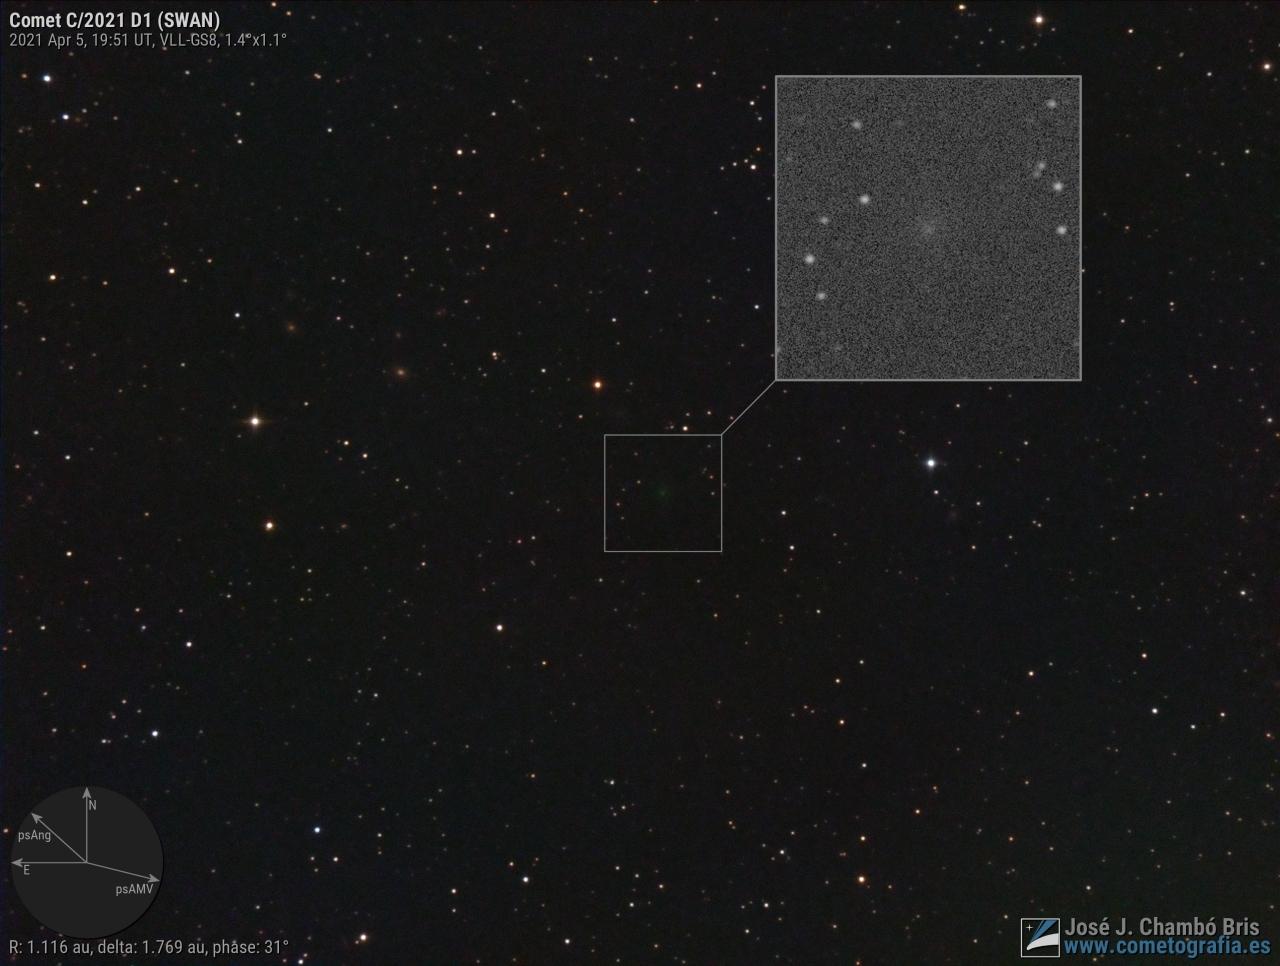 Cometa C/2021 D1 (SWAN)